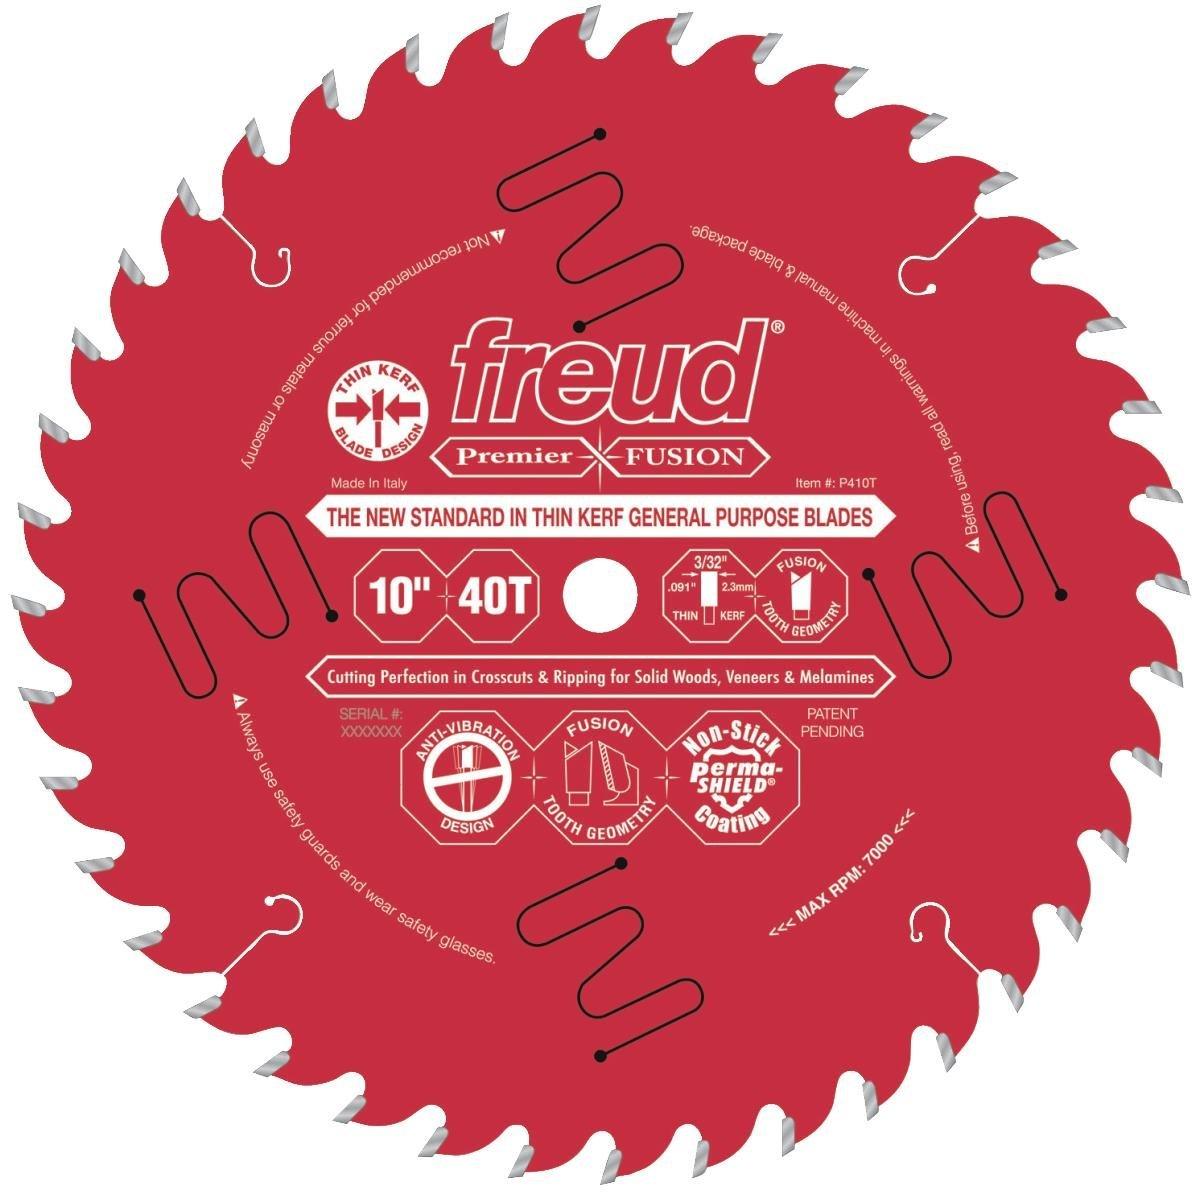 "Freud Premier Fusion 40T Thin Kerf 10"" Table Saw Blade - via Amazon $54.82"